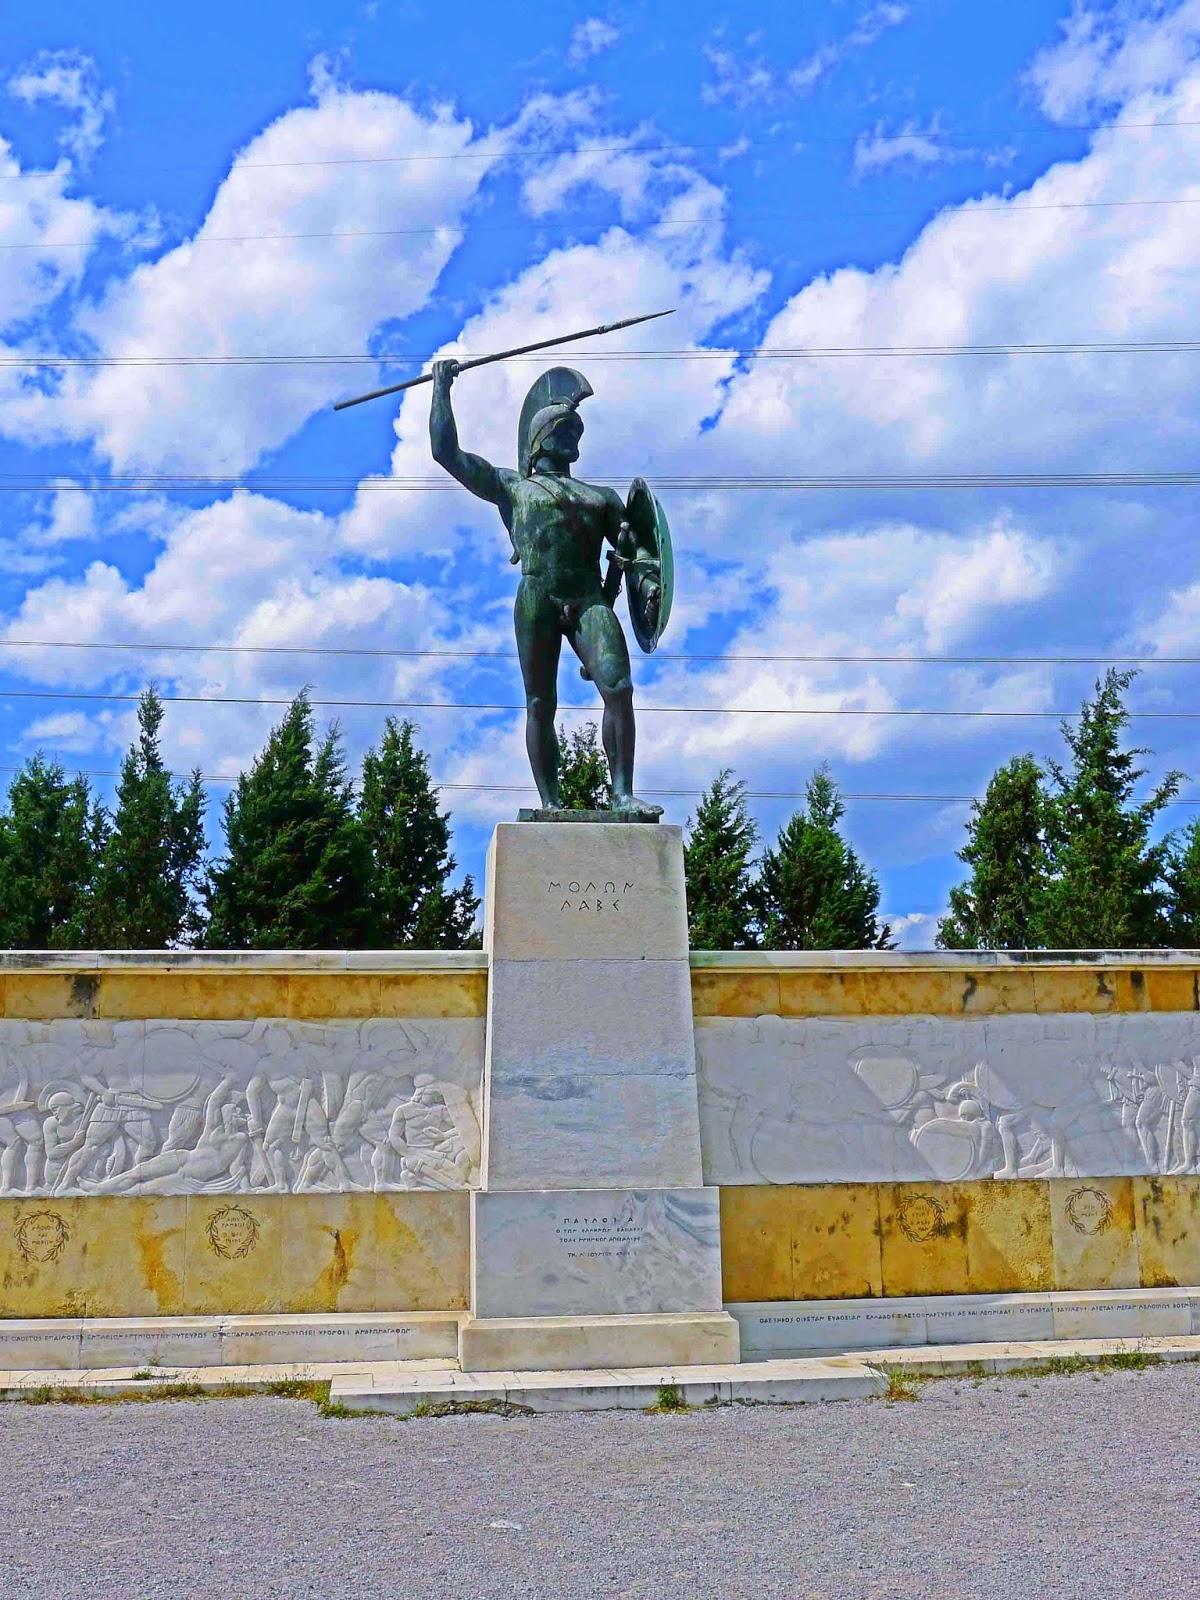 Thermopylae Leonidas